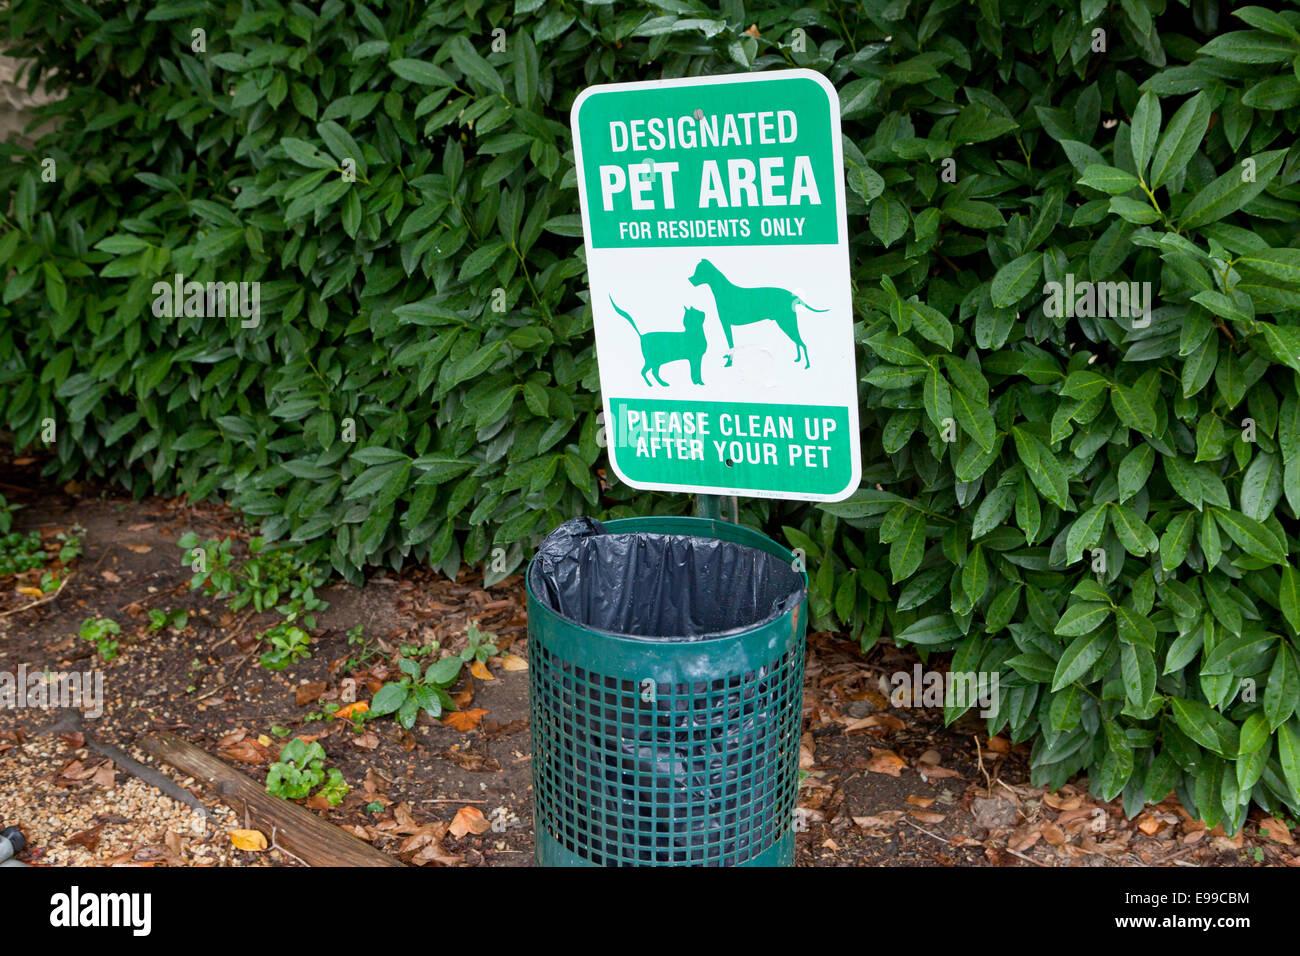 Designated pet area sign - USA - Stock Image